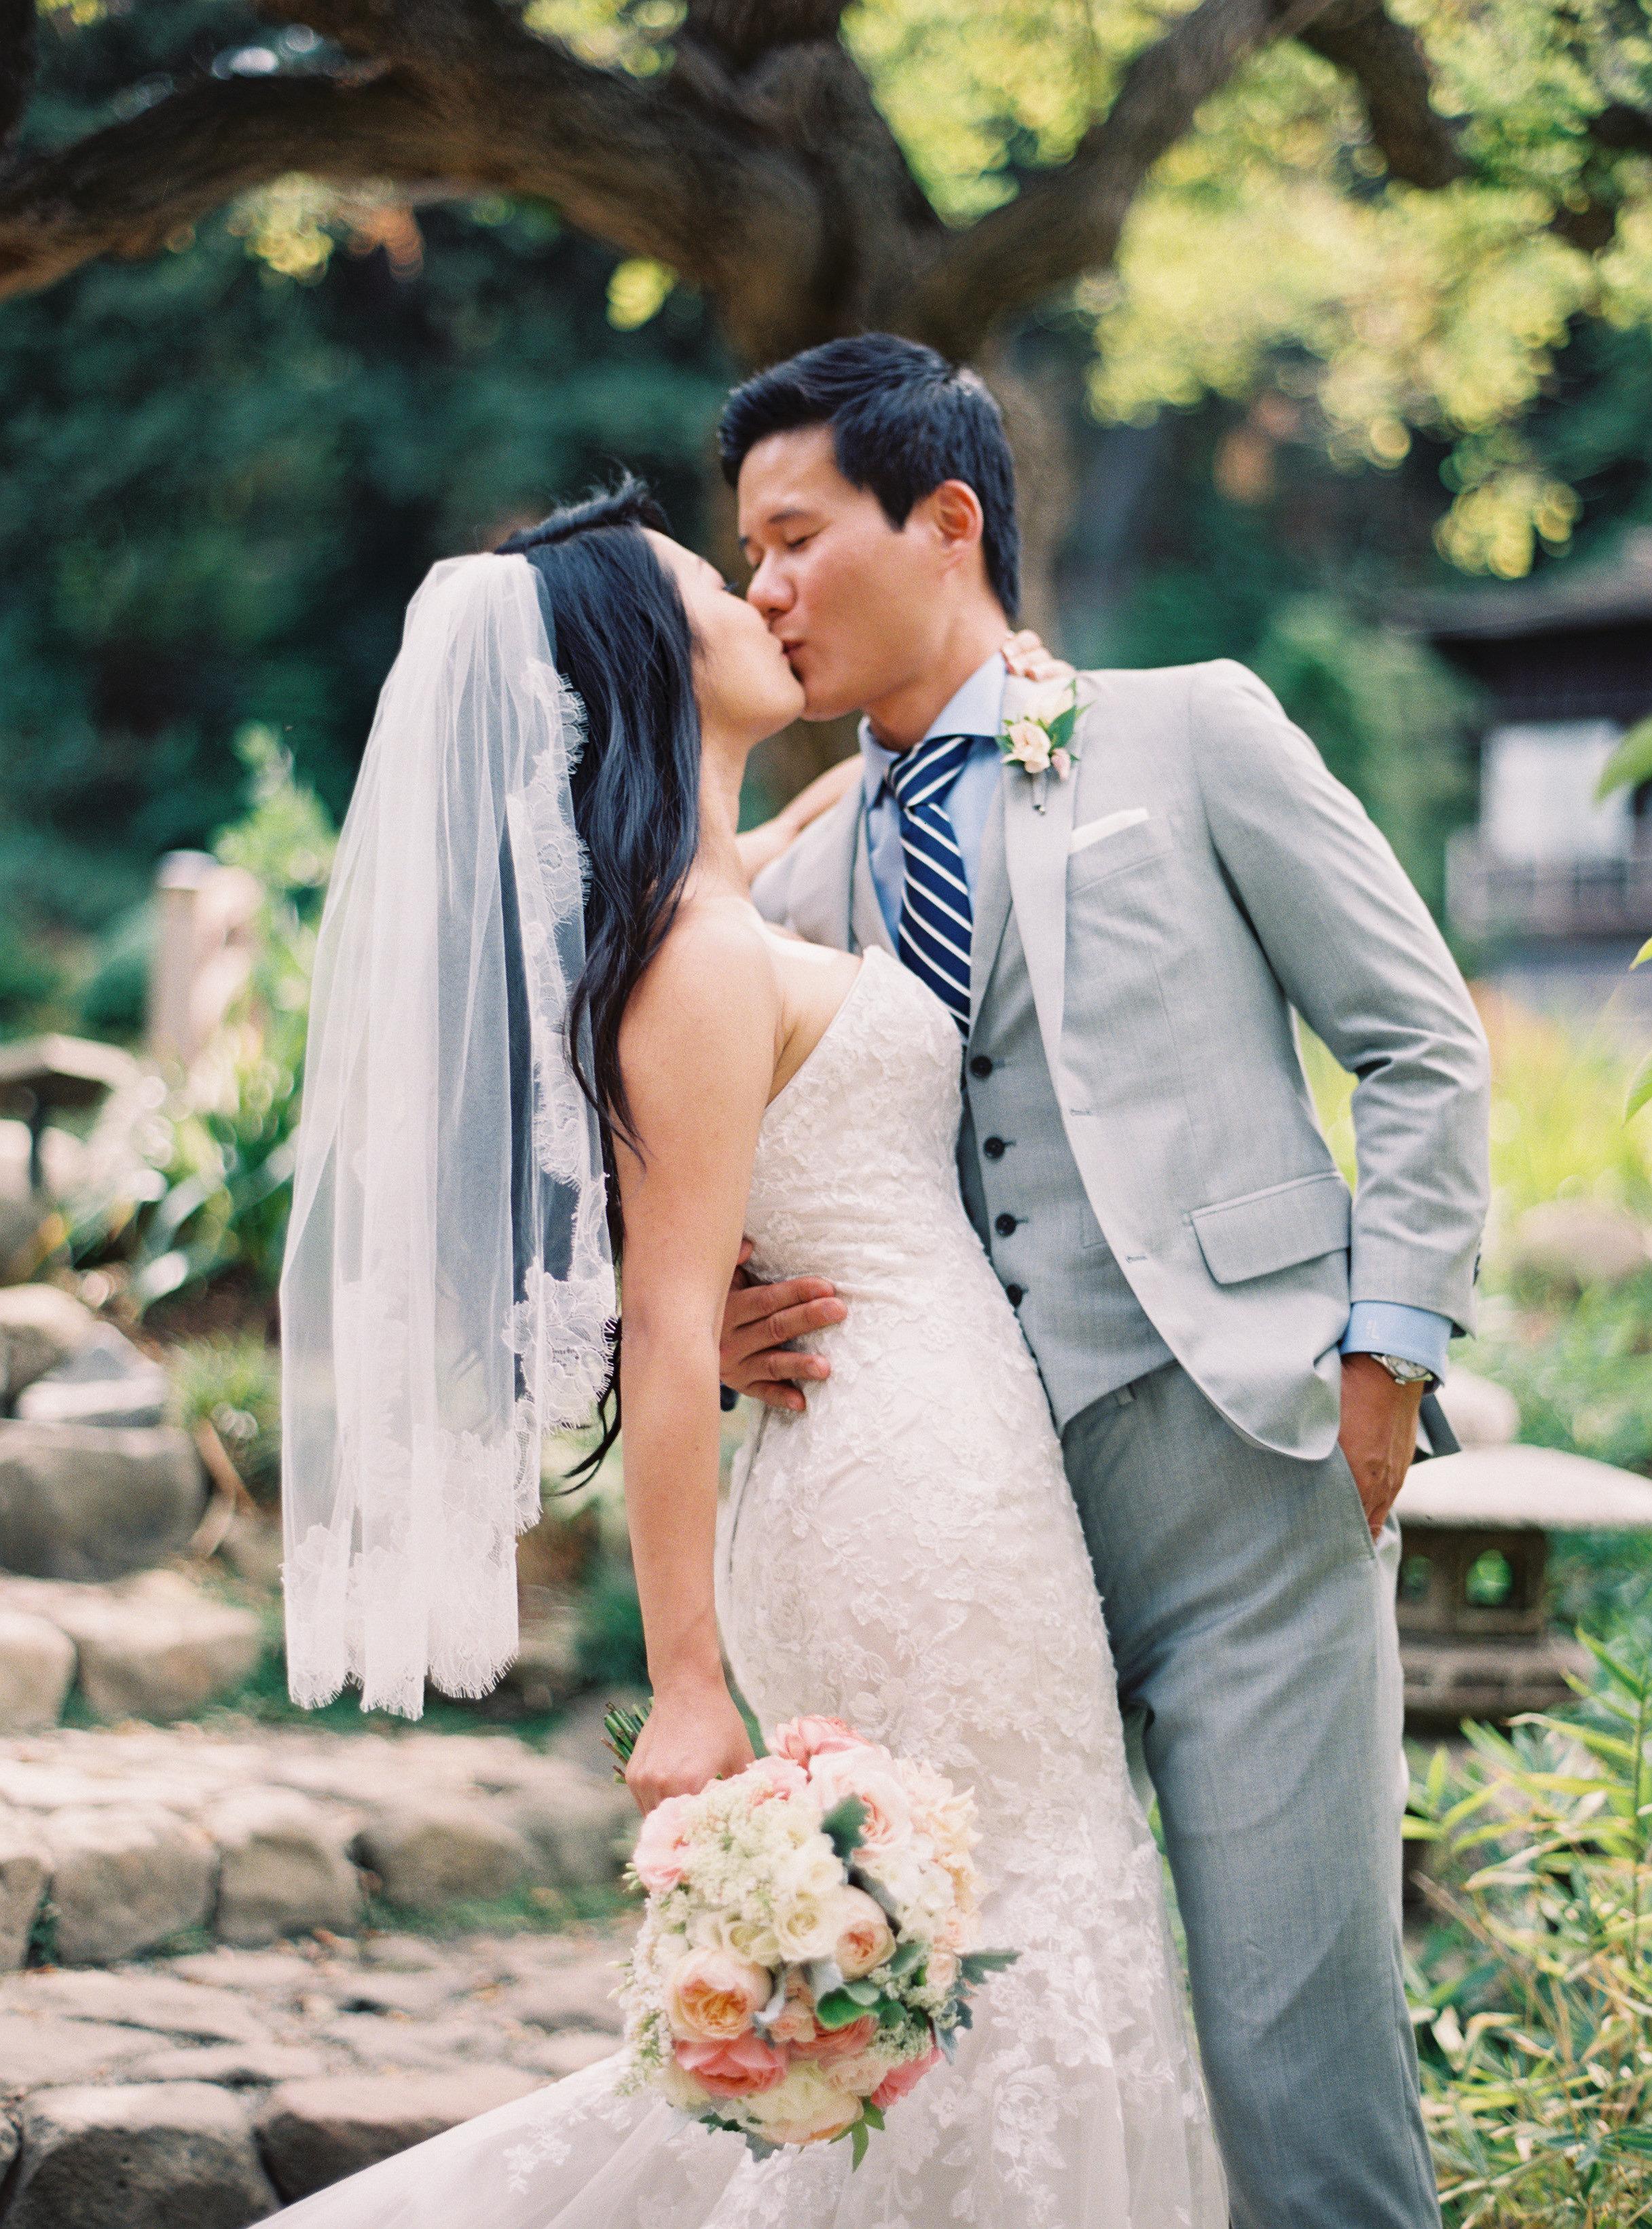 LindaTranPhotography-Flowerstory-Saratoga-wedding-kiss.jpg